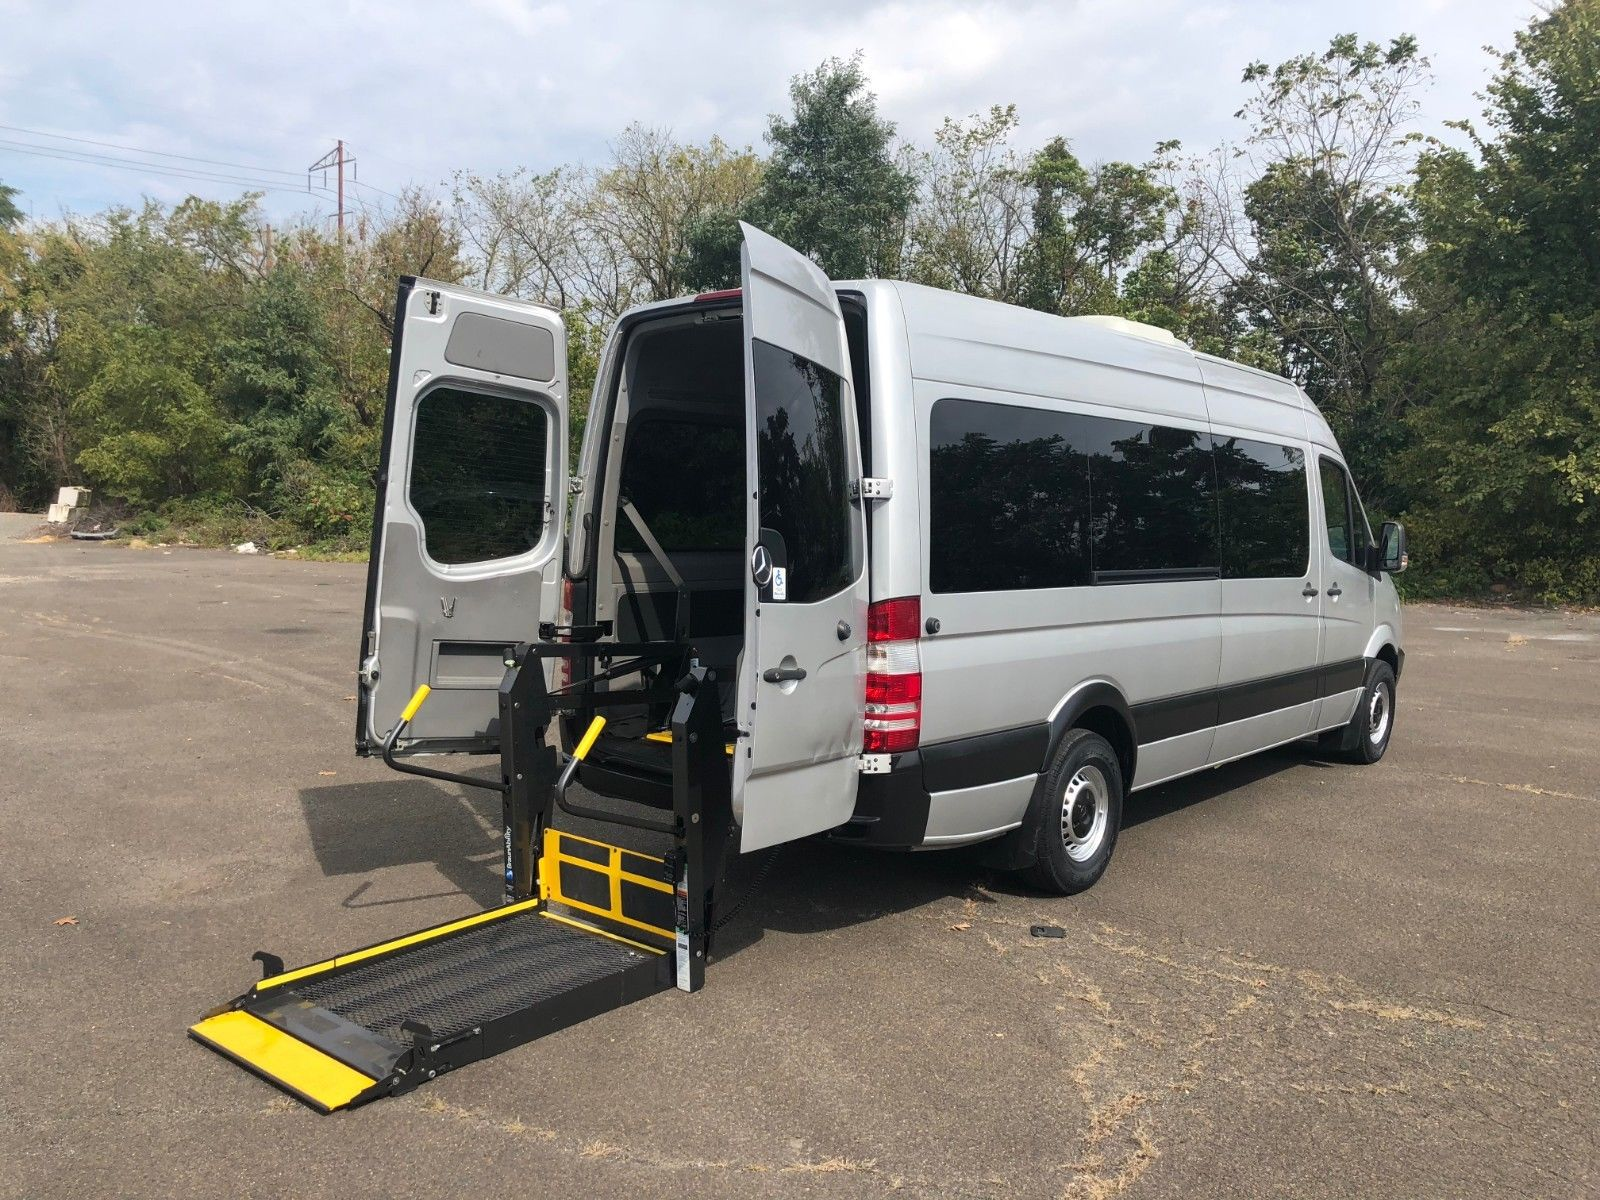 Awesome 2017 Mercedes Benz Sprinter Handicap Van Wheel Chair Lift 12 Penger Plus 1 2018